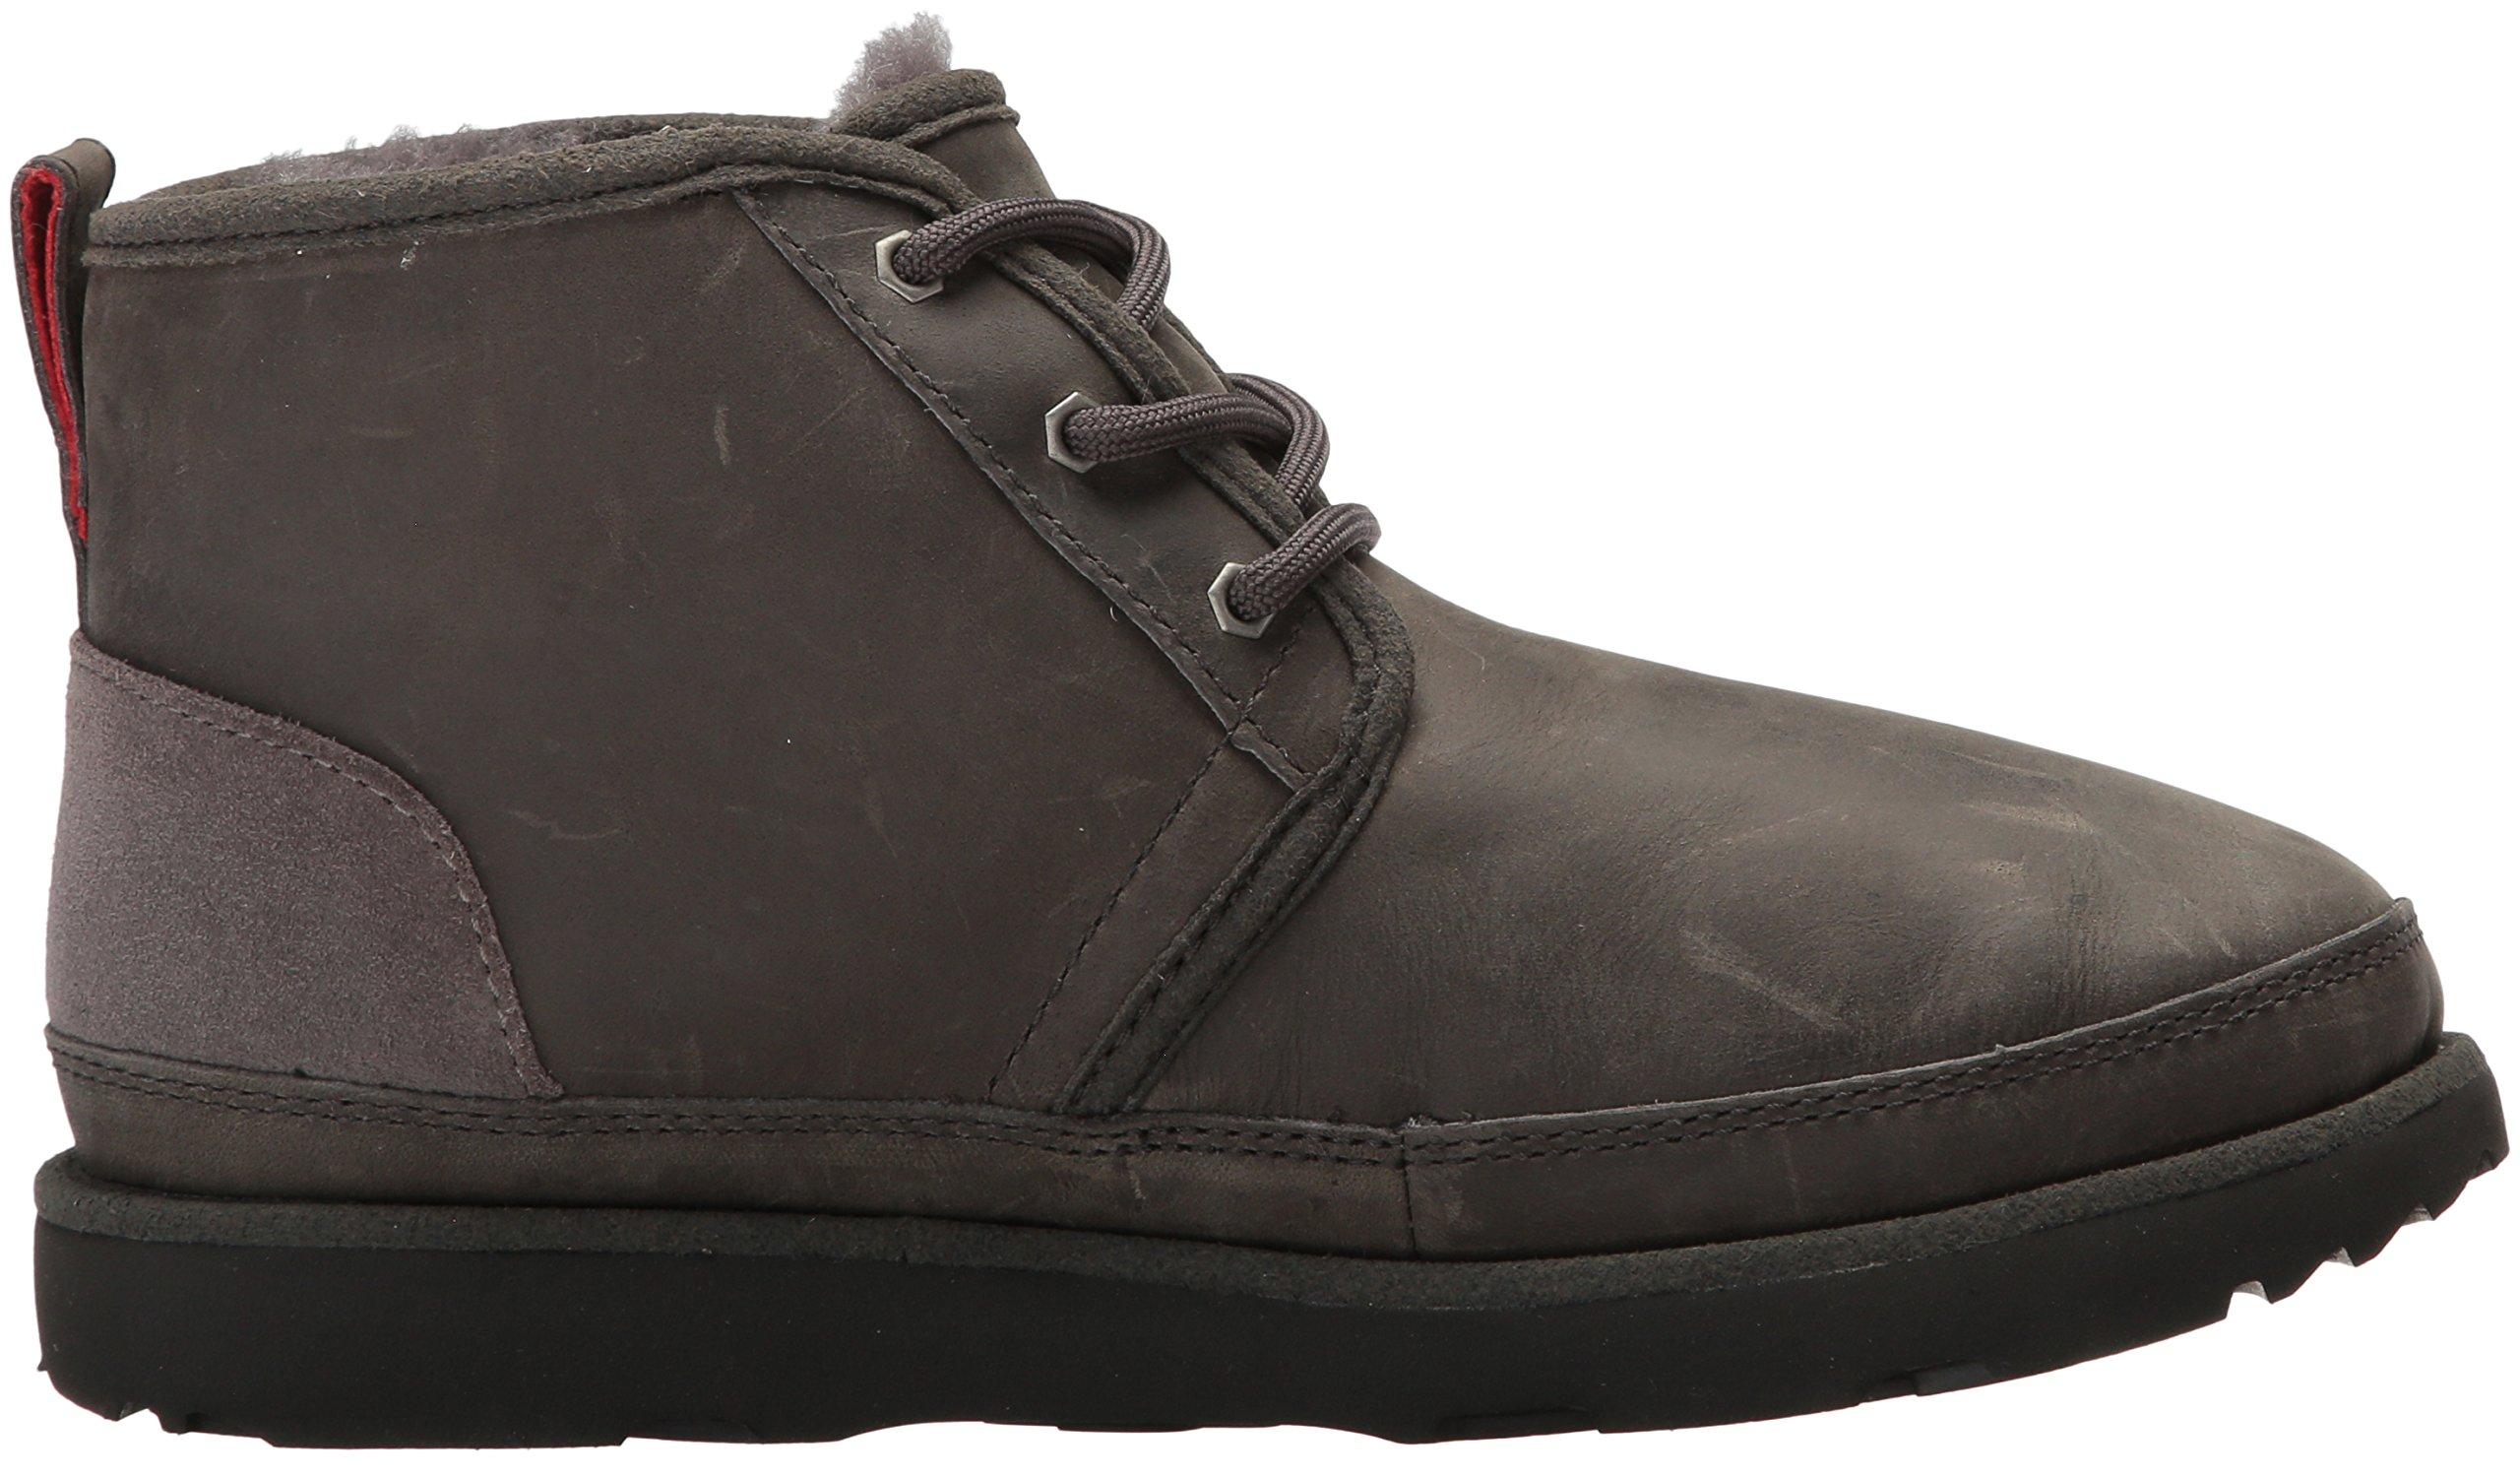 UGG Kids K Neumel II WP Pull-on Boot, Charcoal, 6 M US Big Kid by UGG (Image #7)